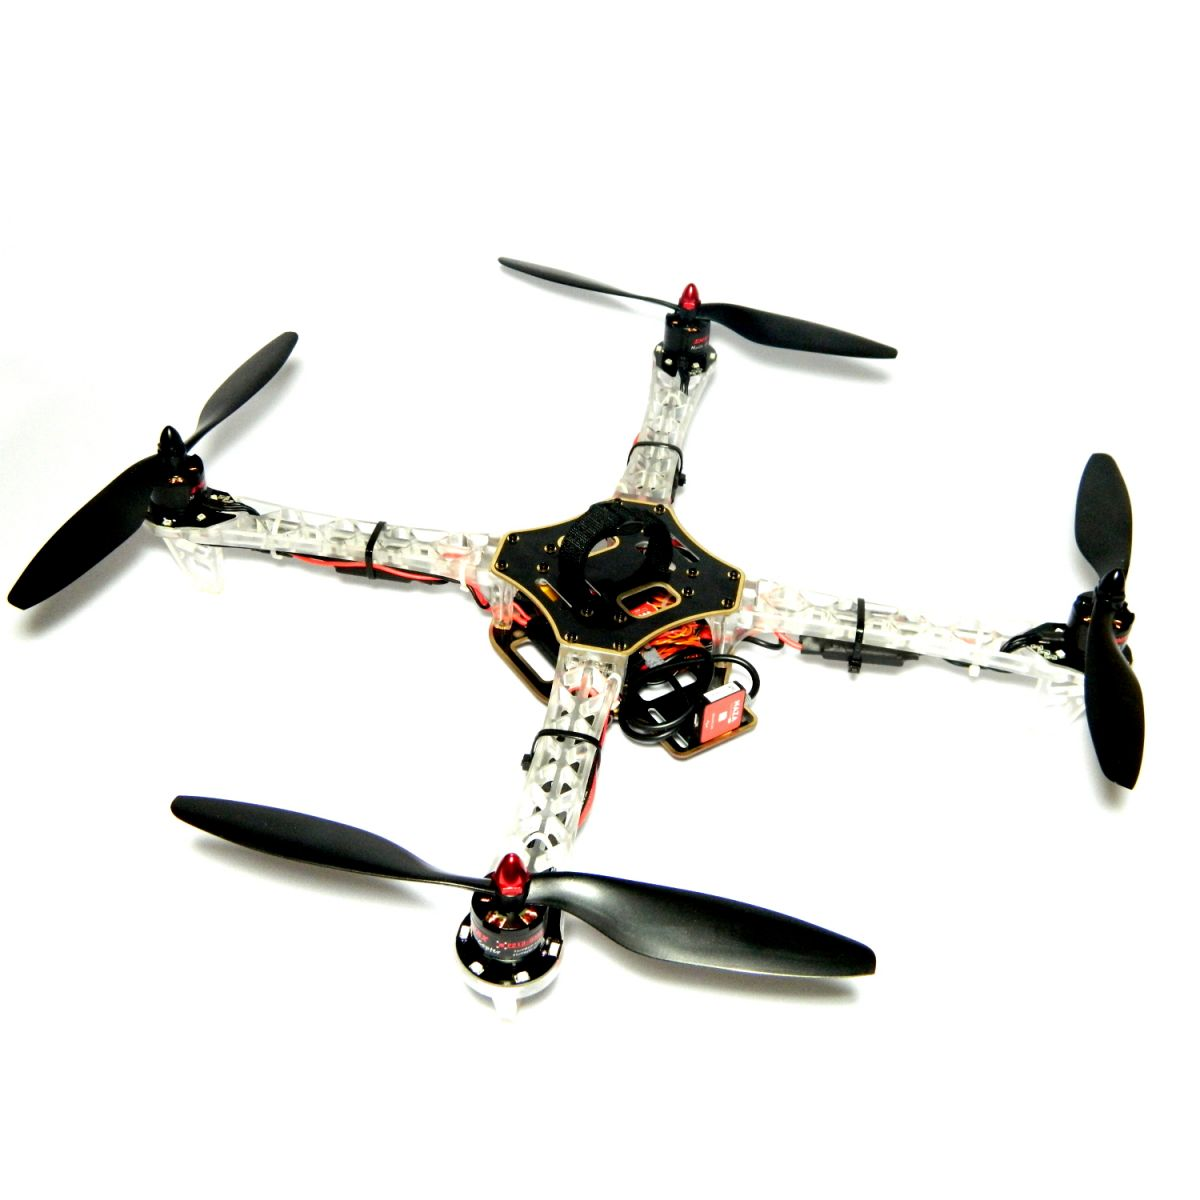 Quadricóptero iFly Q450 Ghost Edition com DJI Naza Lite  - iFly Electric Hobby